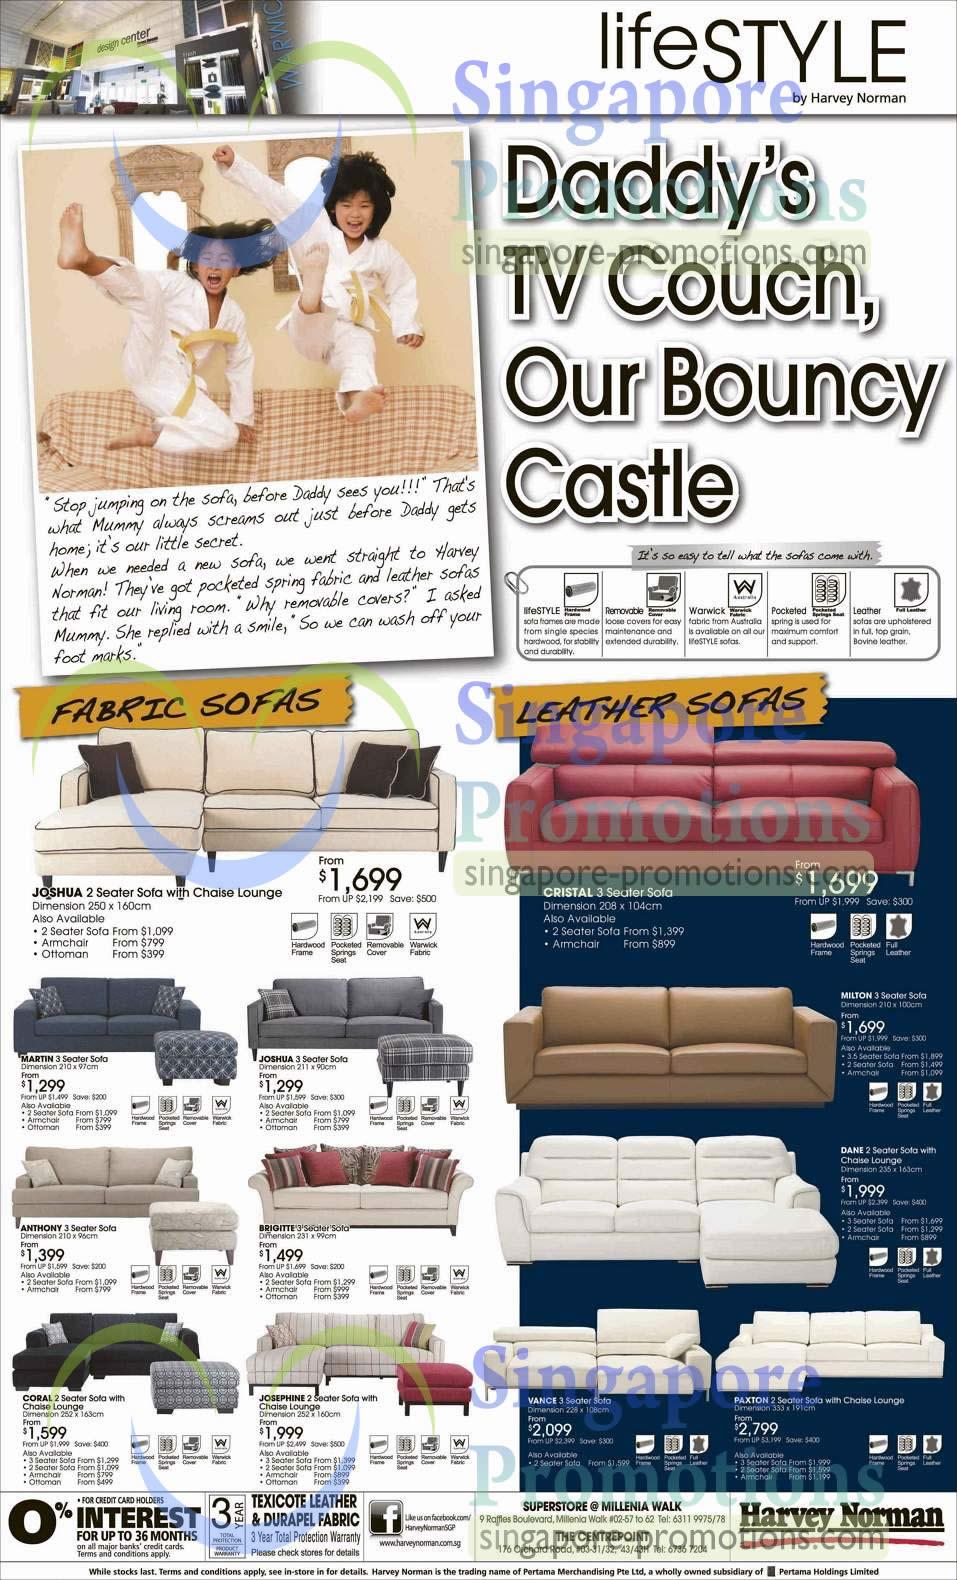 Sofa Sets Joshua, Martin, Cristal, Milton, Anthony, Coral, Vance